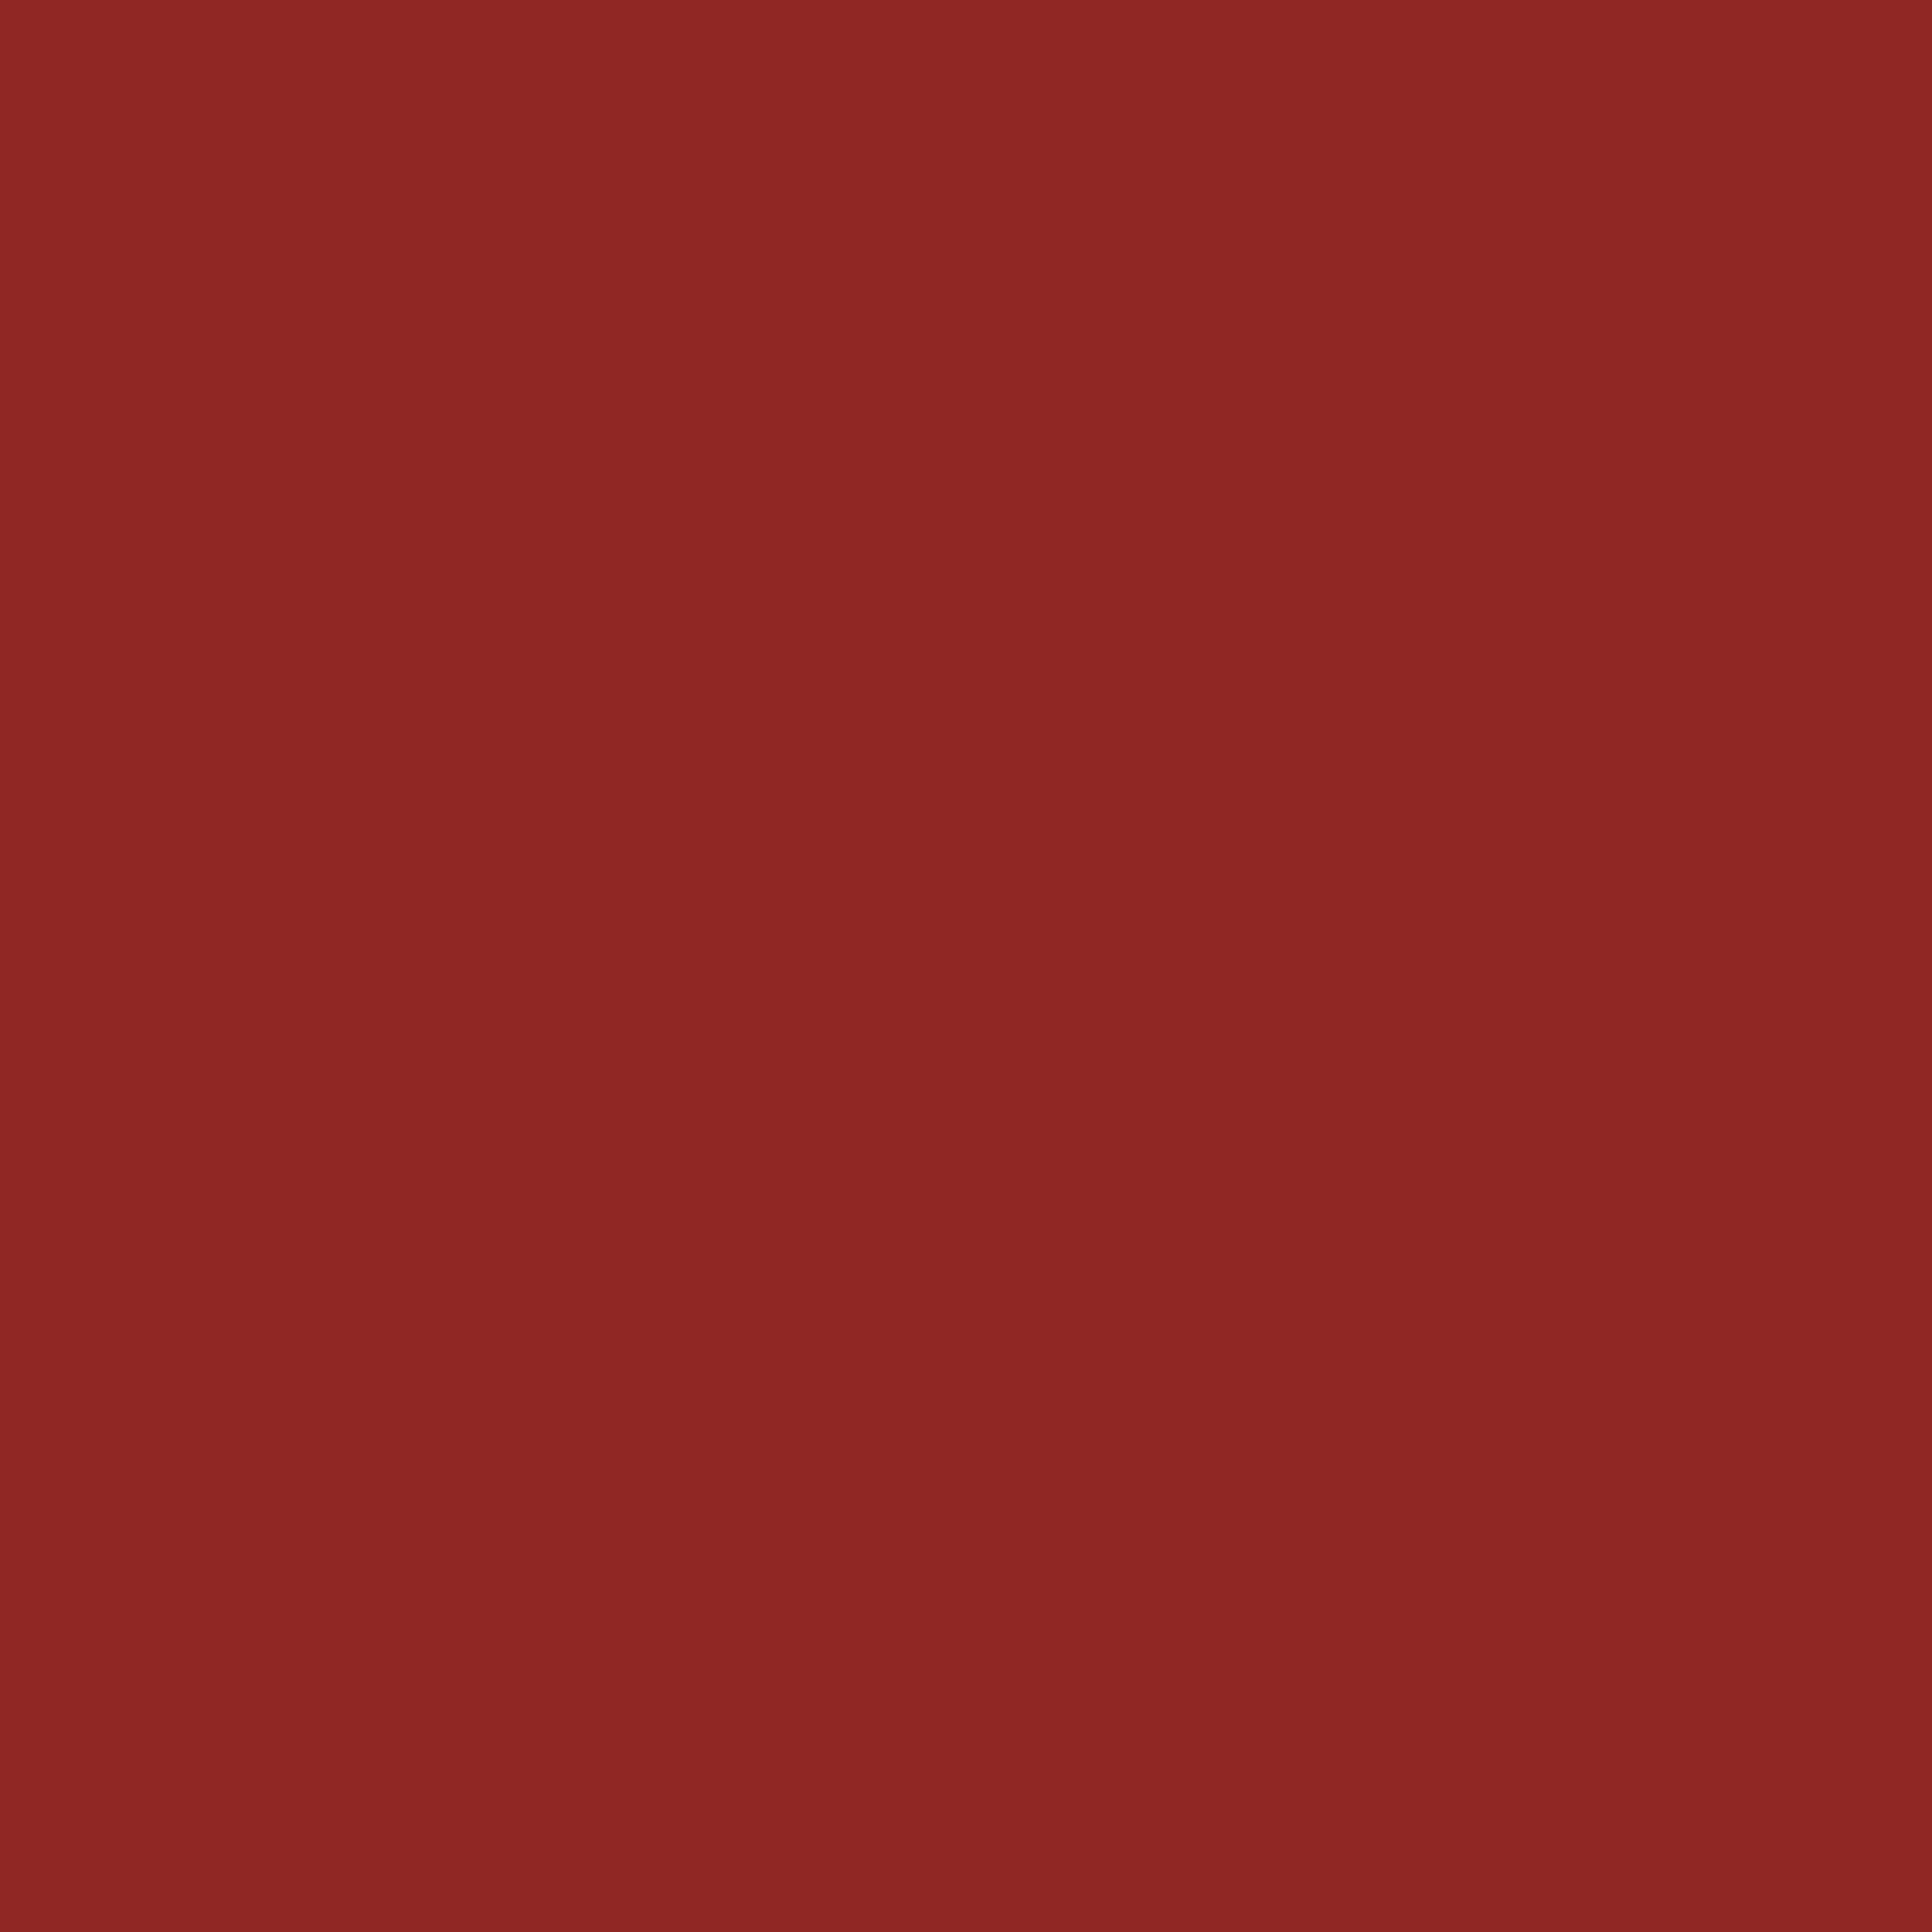 2732x2732 Vivid Auburn Solid Color Background